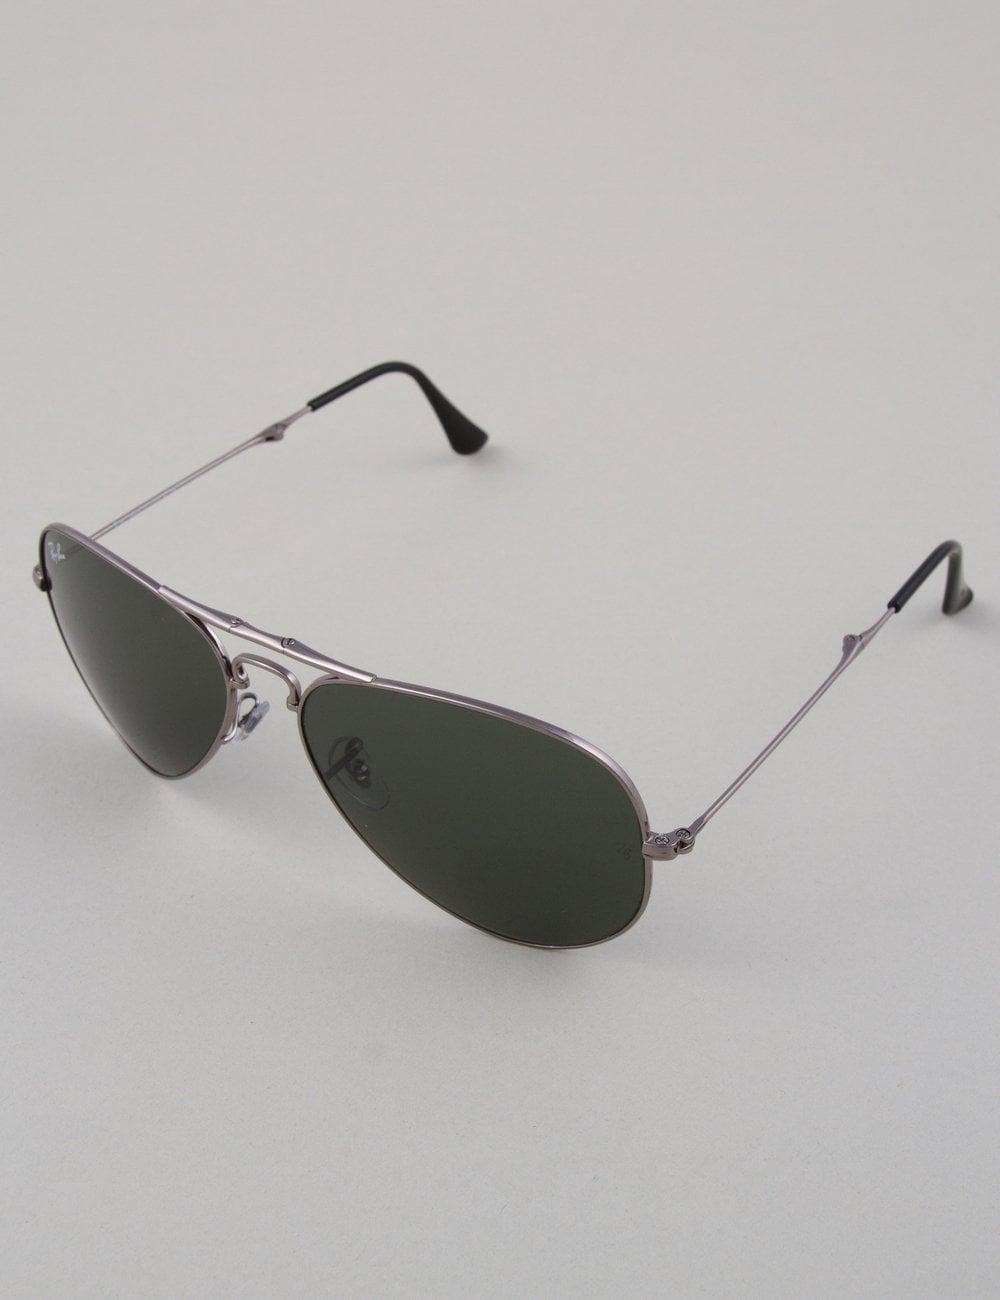 ray ban folding aviator uk  ray ban aviator folding sunglasses gunmetal // crystal green accessories from fat buddha store uk